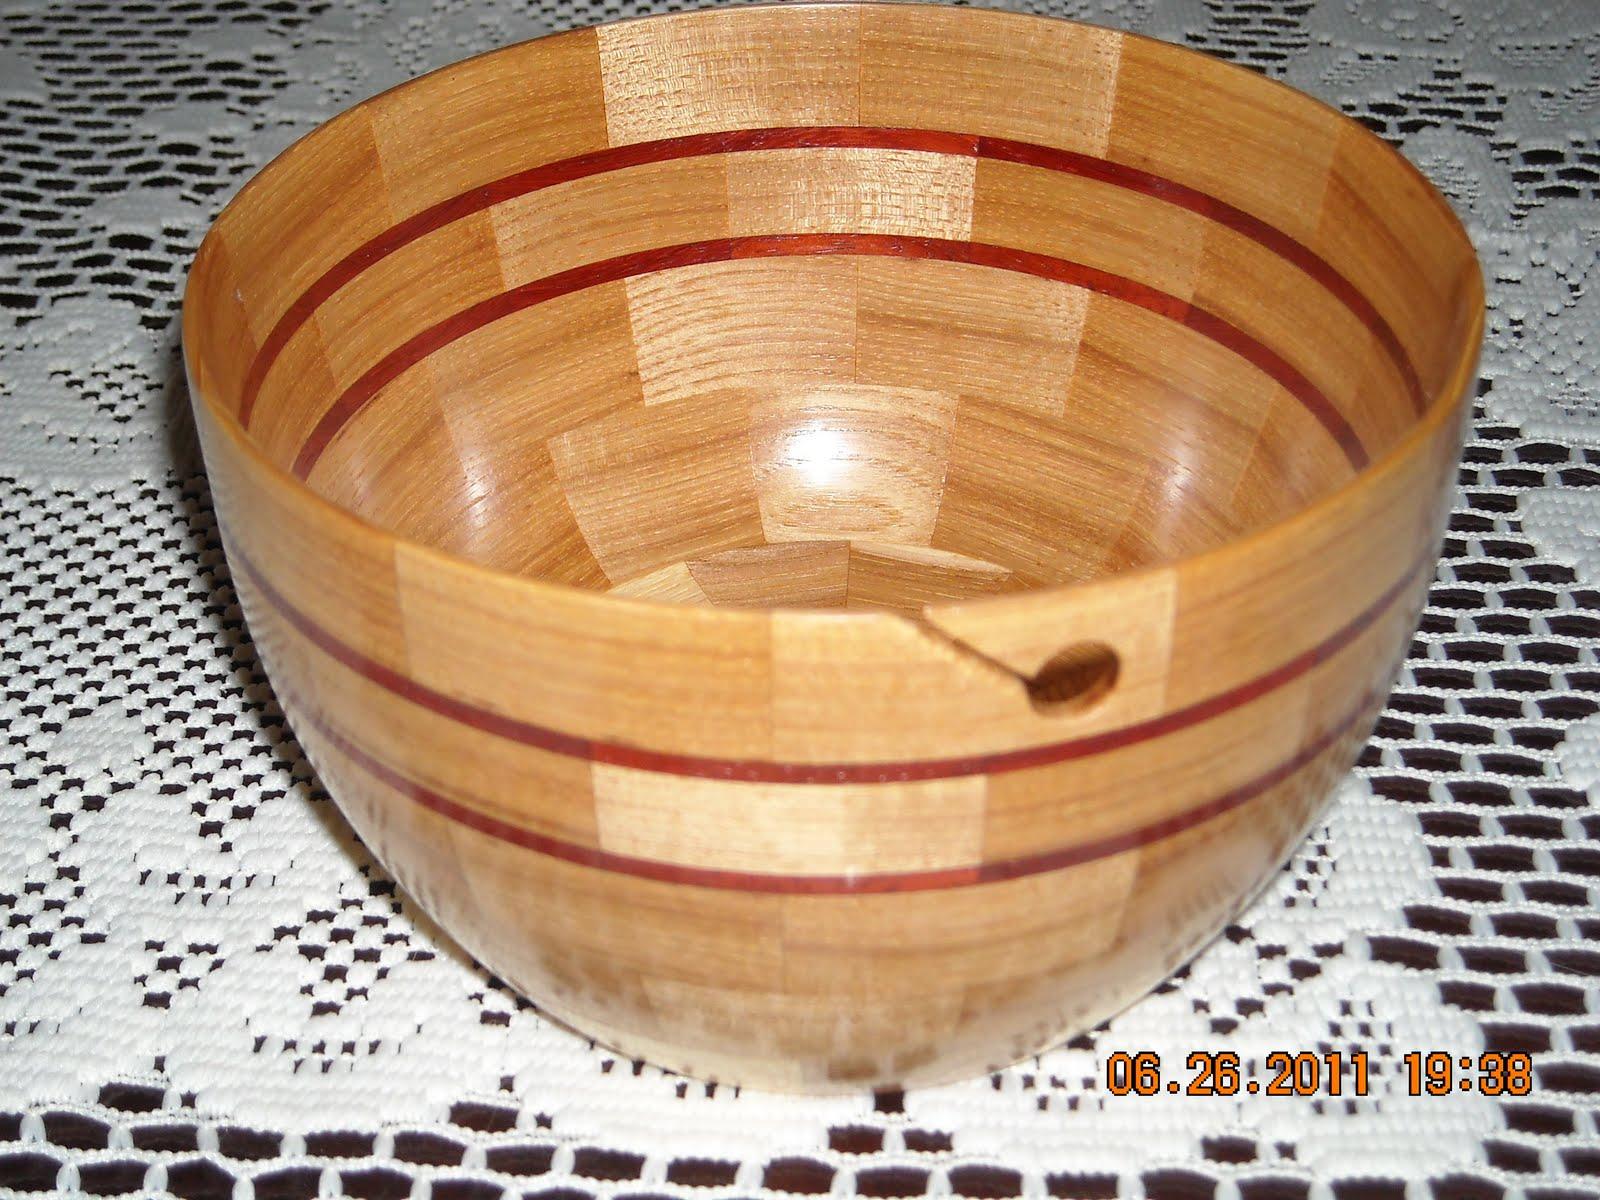 Knitting Bowls Wood : Wood by larry yarn bowls